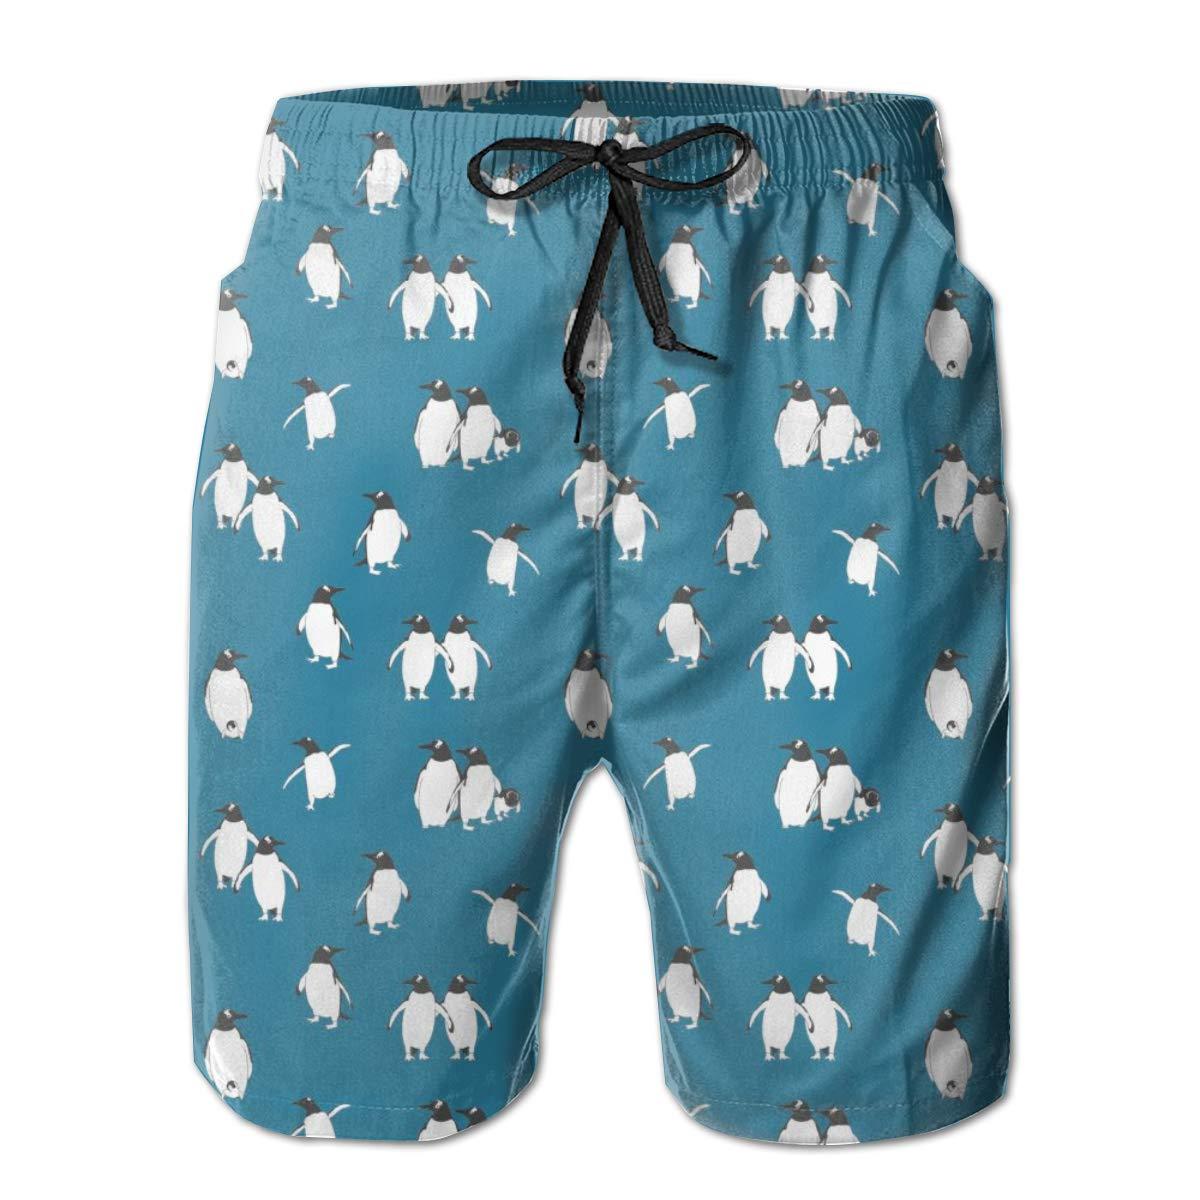 YongColer Men Swim Trunks Drawstring Elastic Waist Beach Shorts Unicorn Repeating Pattern